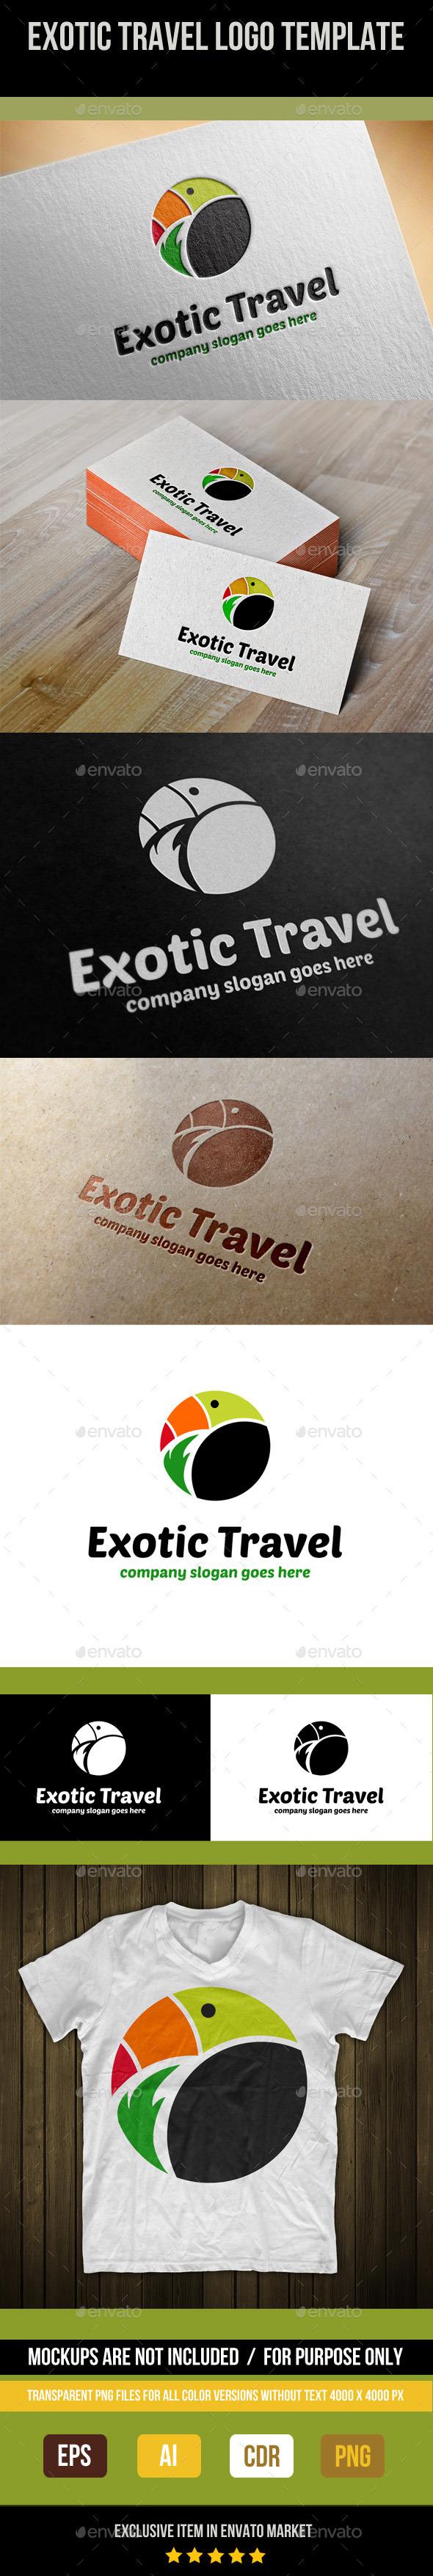 Exotic Travel Logo Template - Abstract Logo Templates